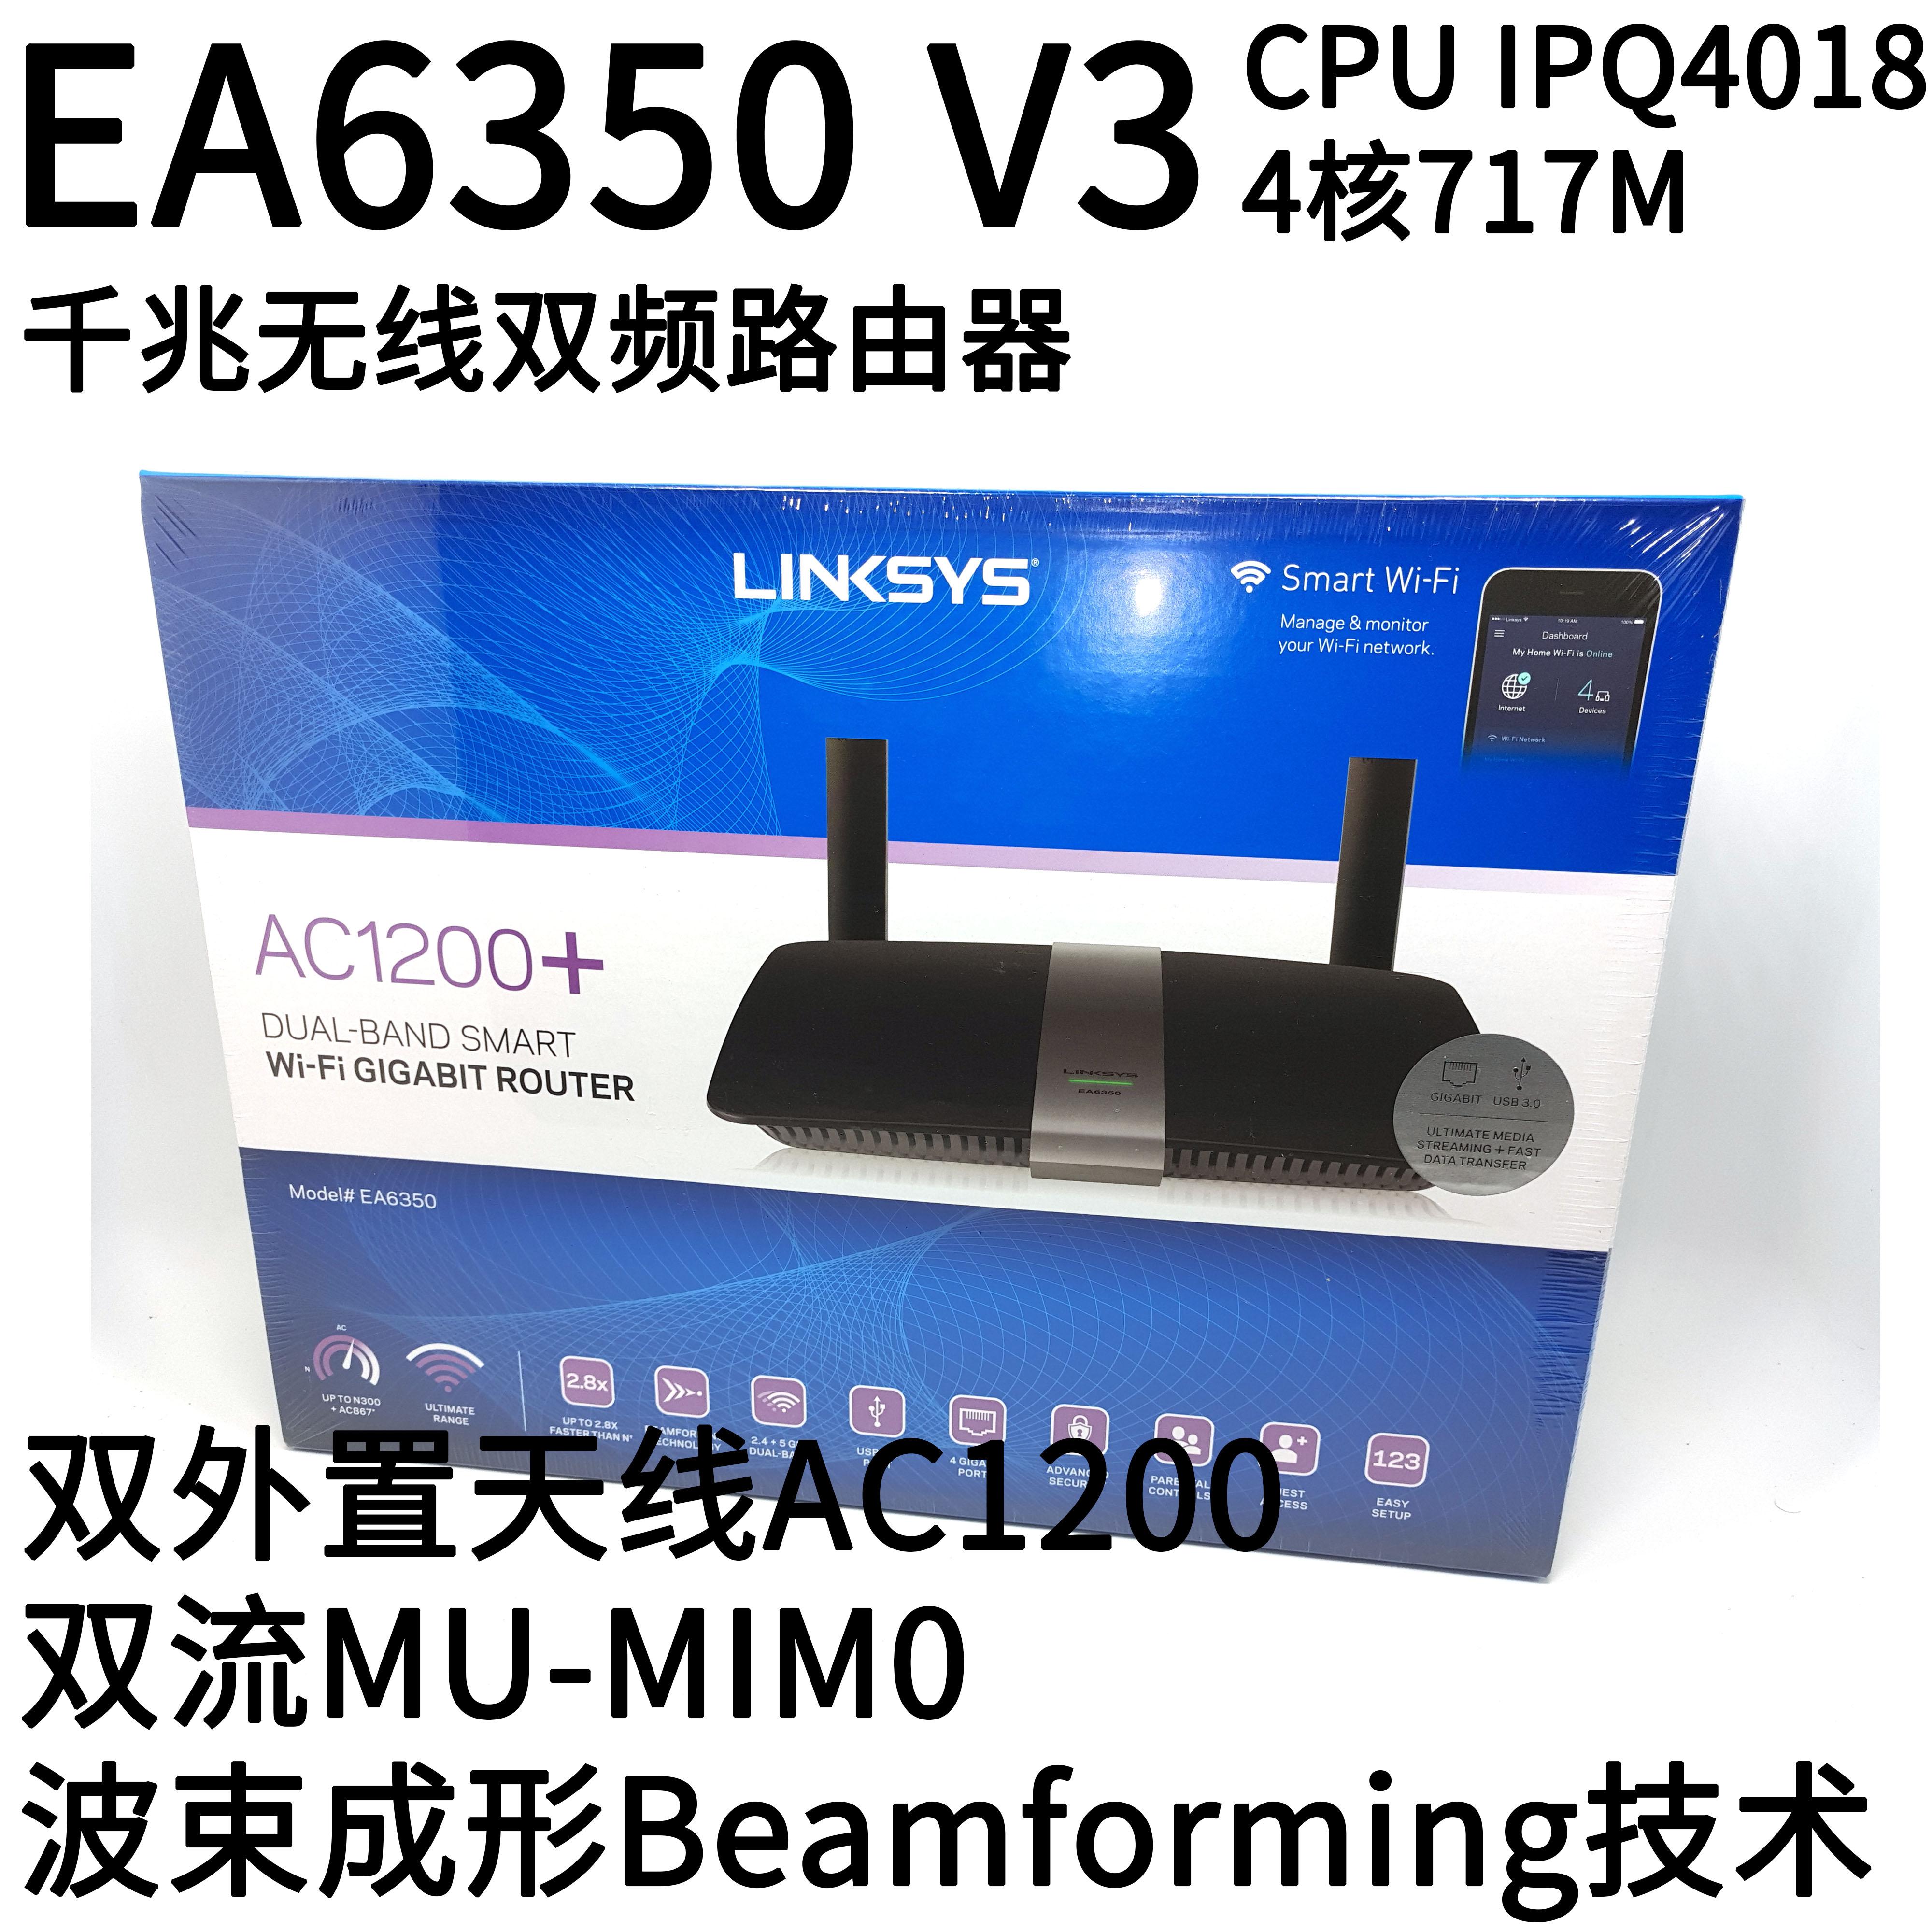 Ea6350 V3 Openwrt